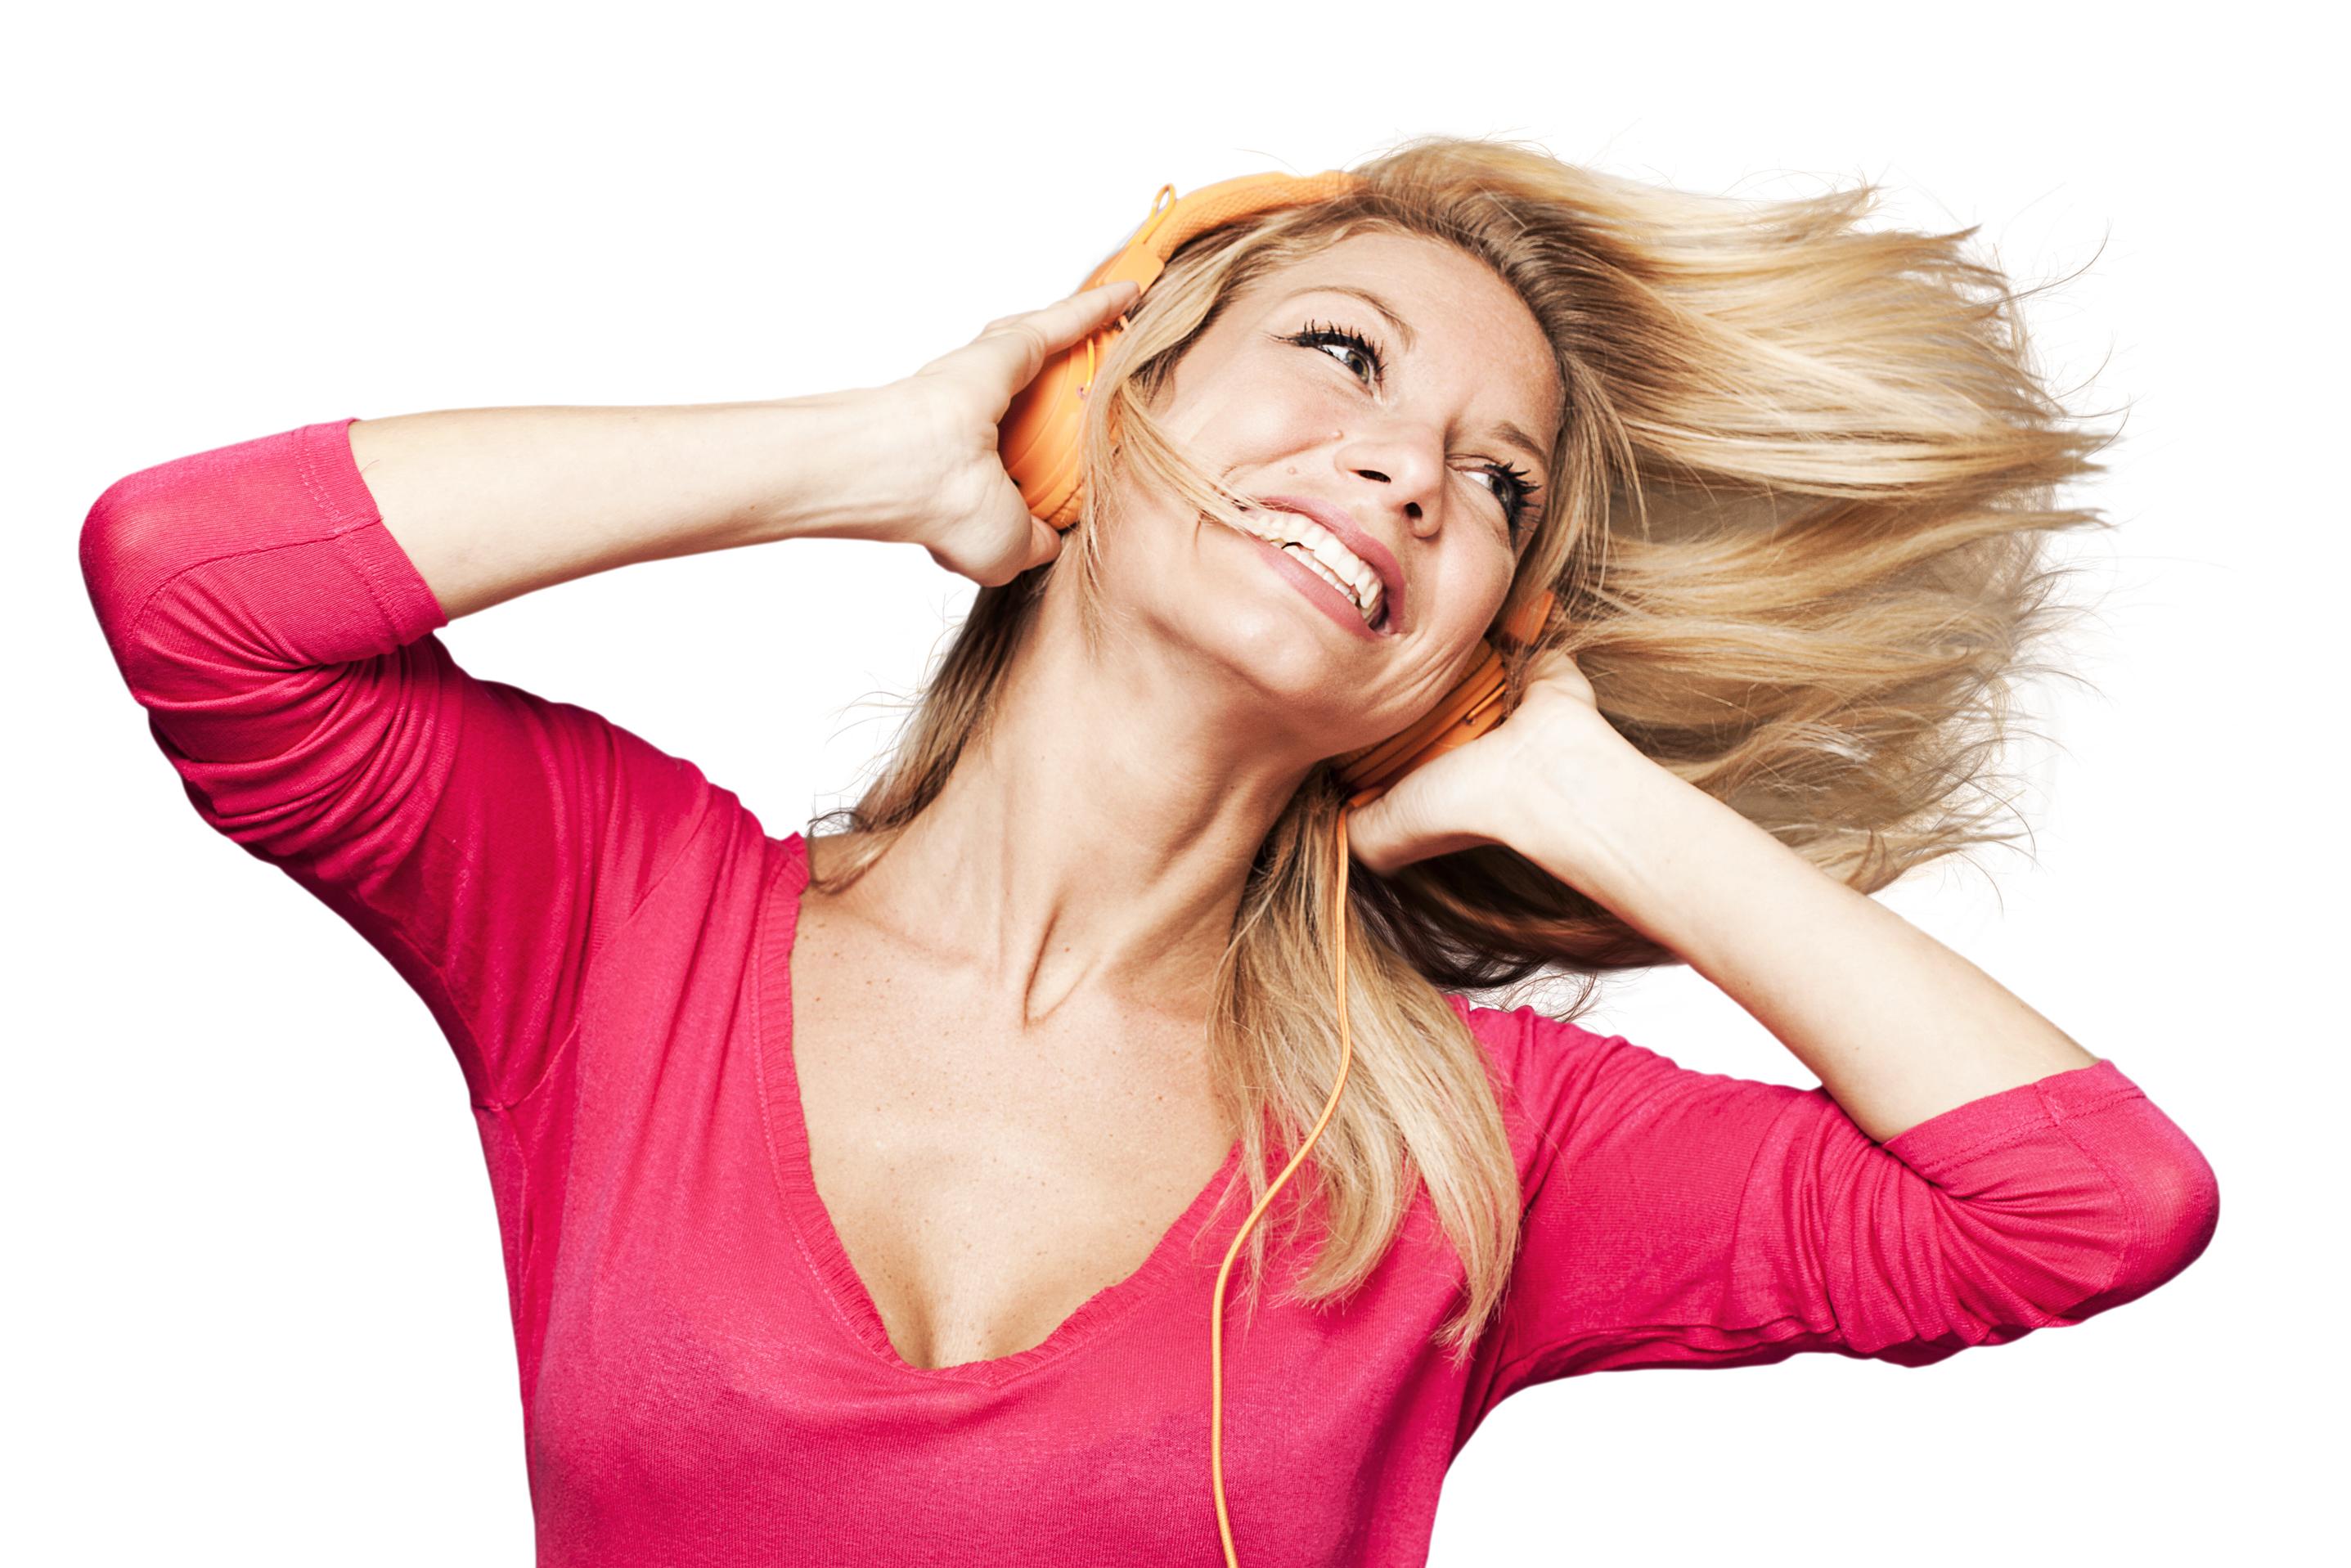 laughing blonde girl enjoying fun music with earphone on